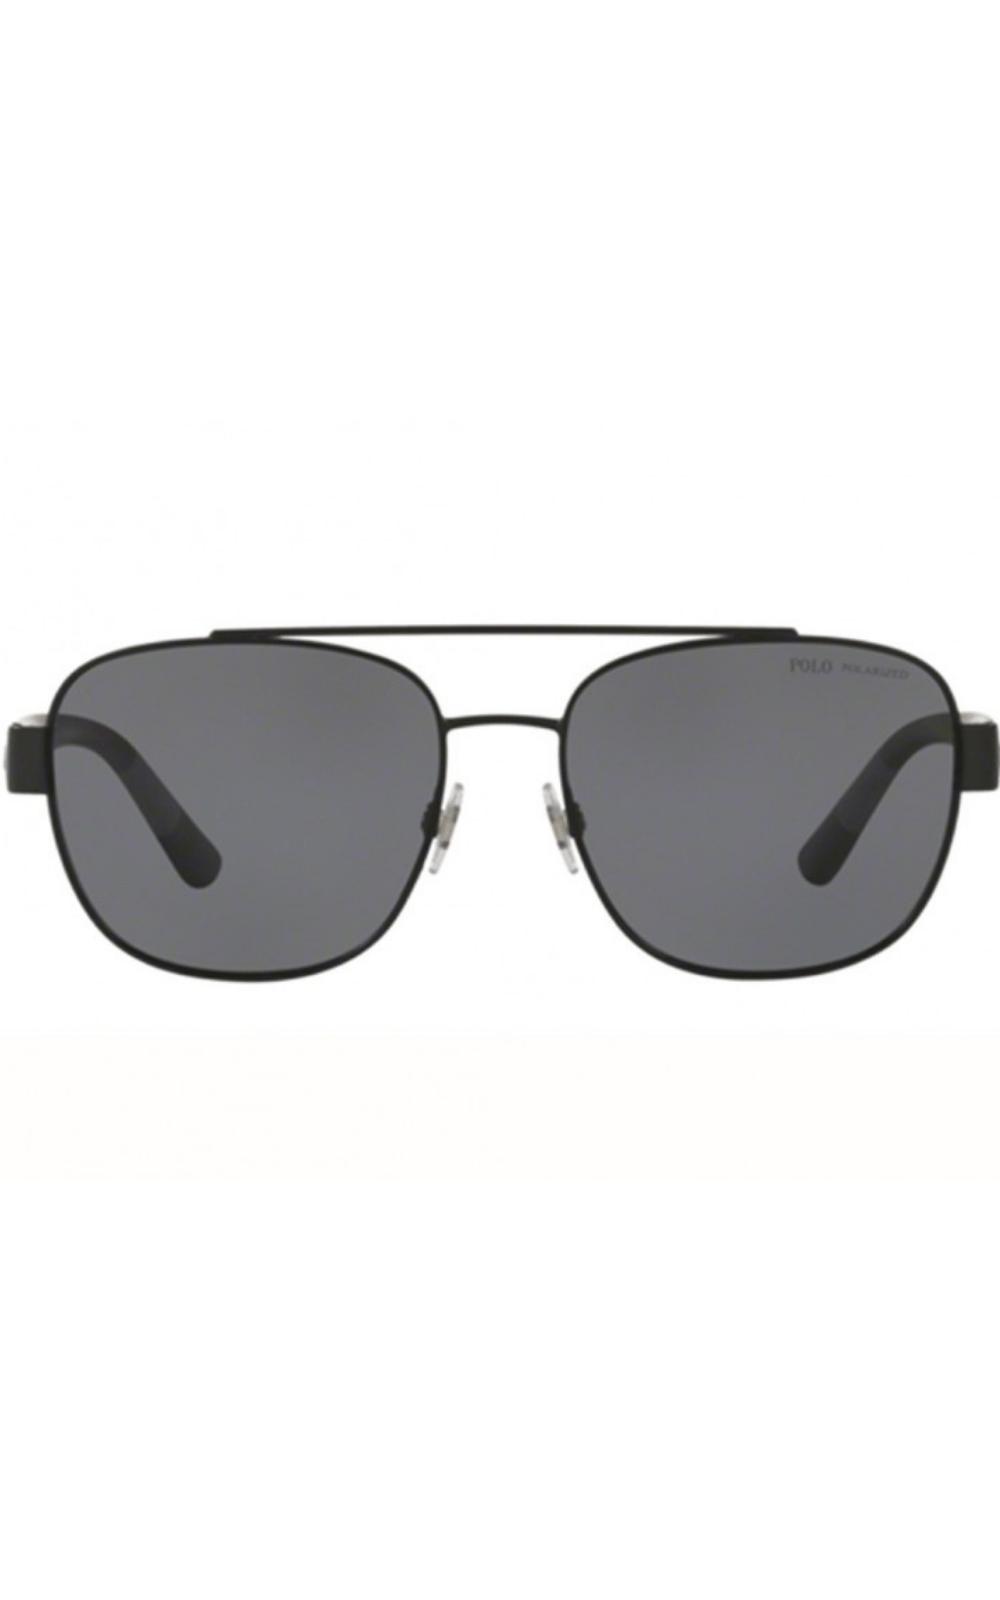 Foto 2 - Óculos de Sol Polo Ralph Lauren 3119 9267/81 Polarizado